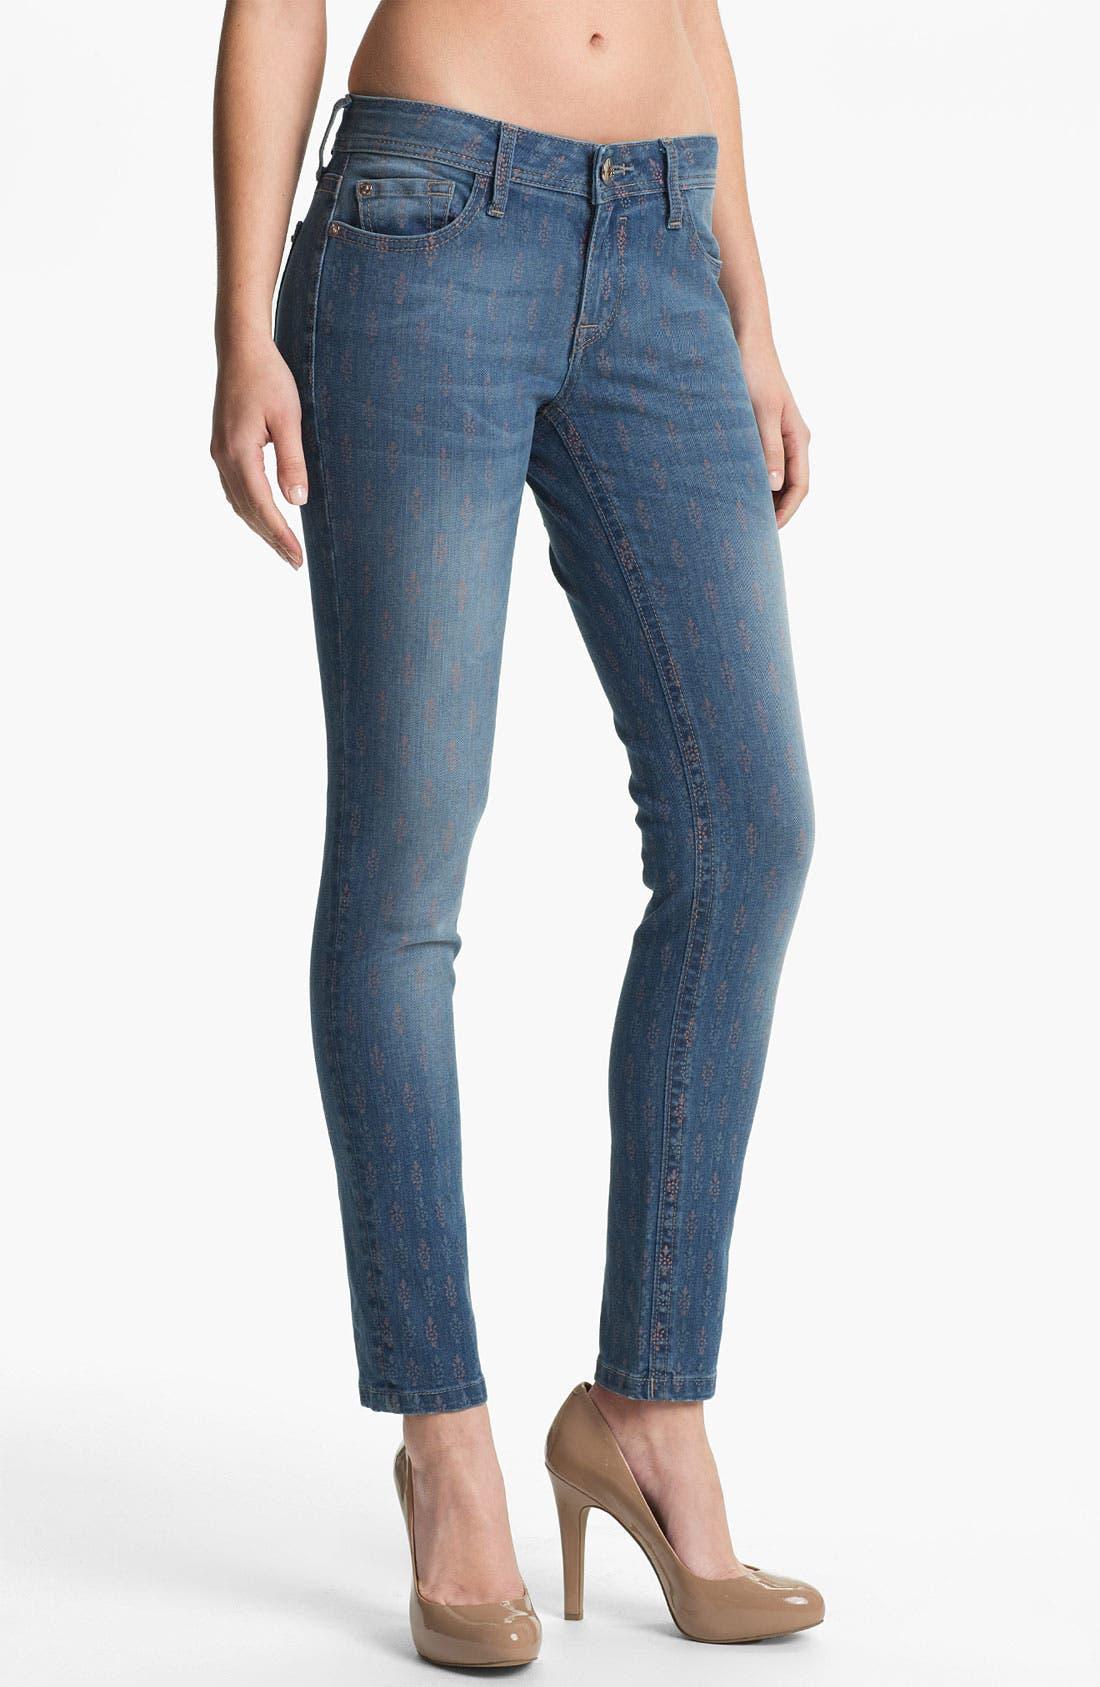 Main Image - DL1961 'Amanda' X-Fit Stretch Print Denim Skinny Jeans (Greenville)